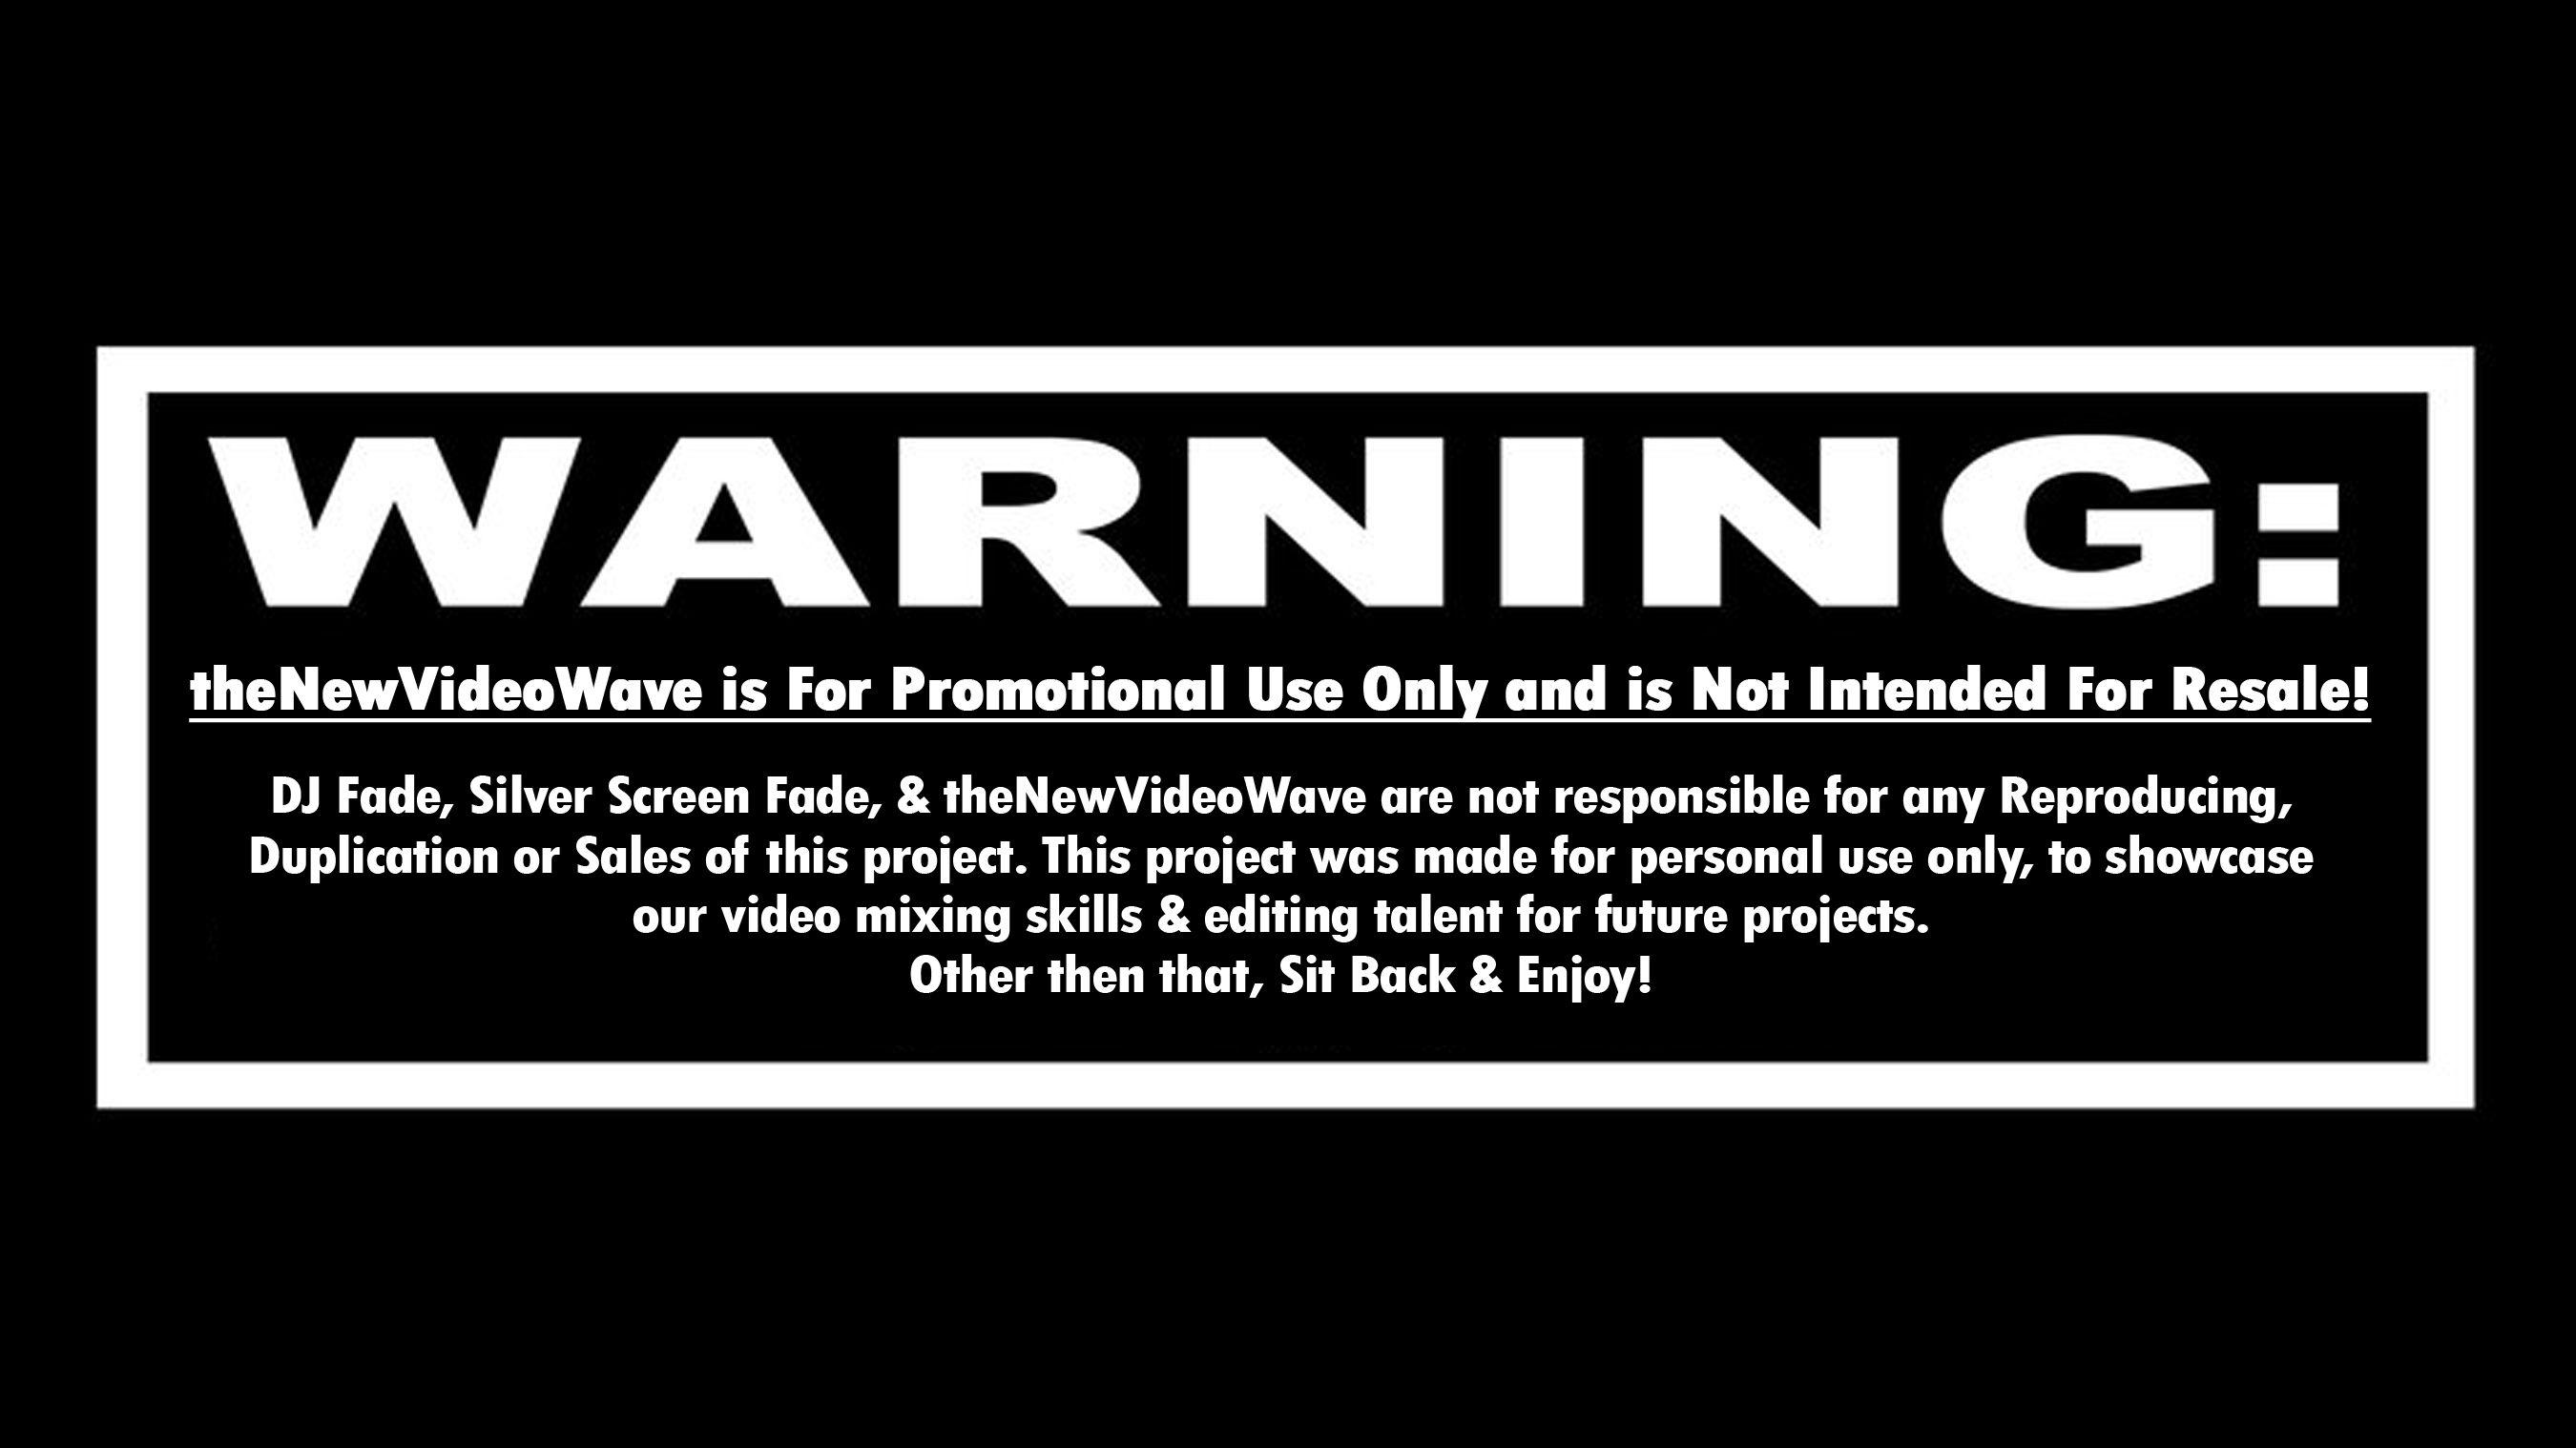 Movie Warning Disclaimer